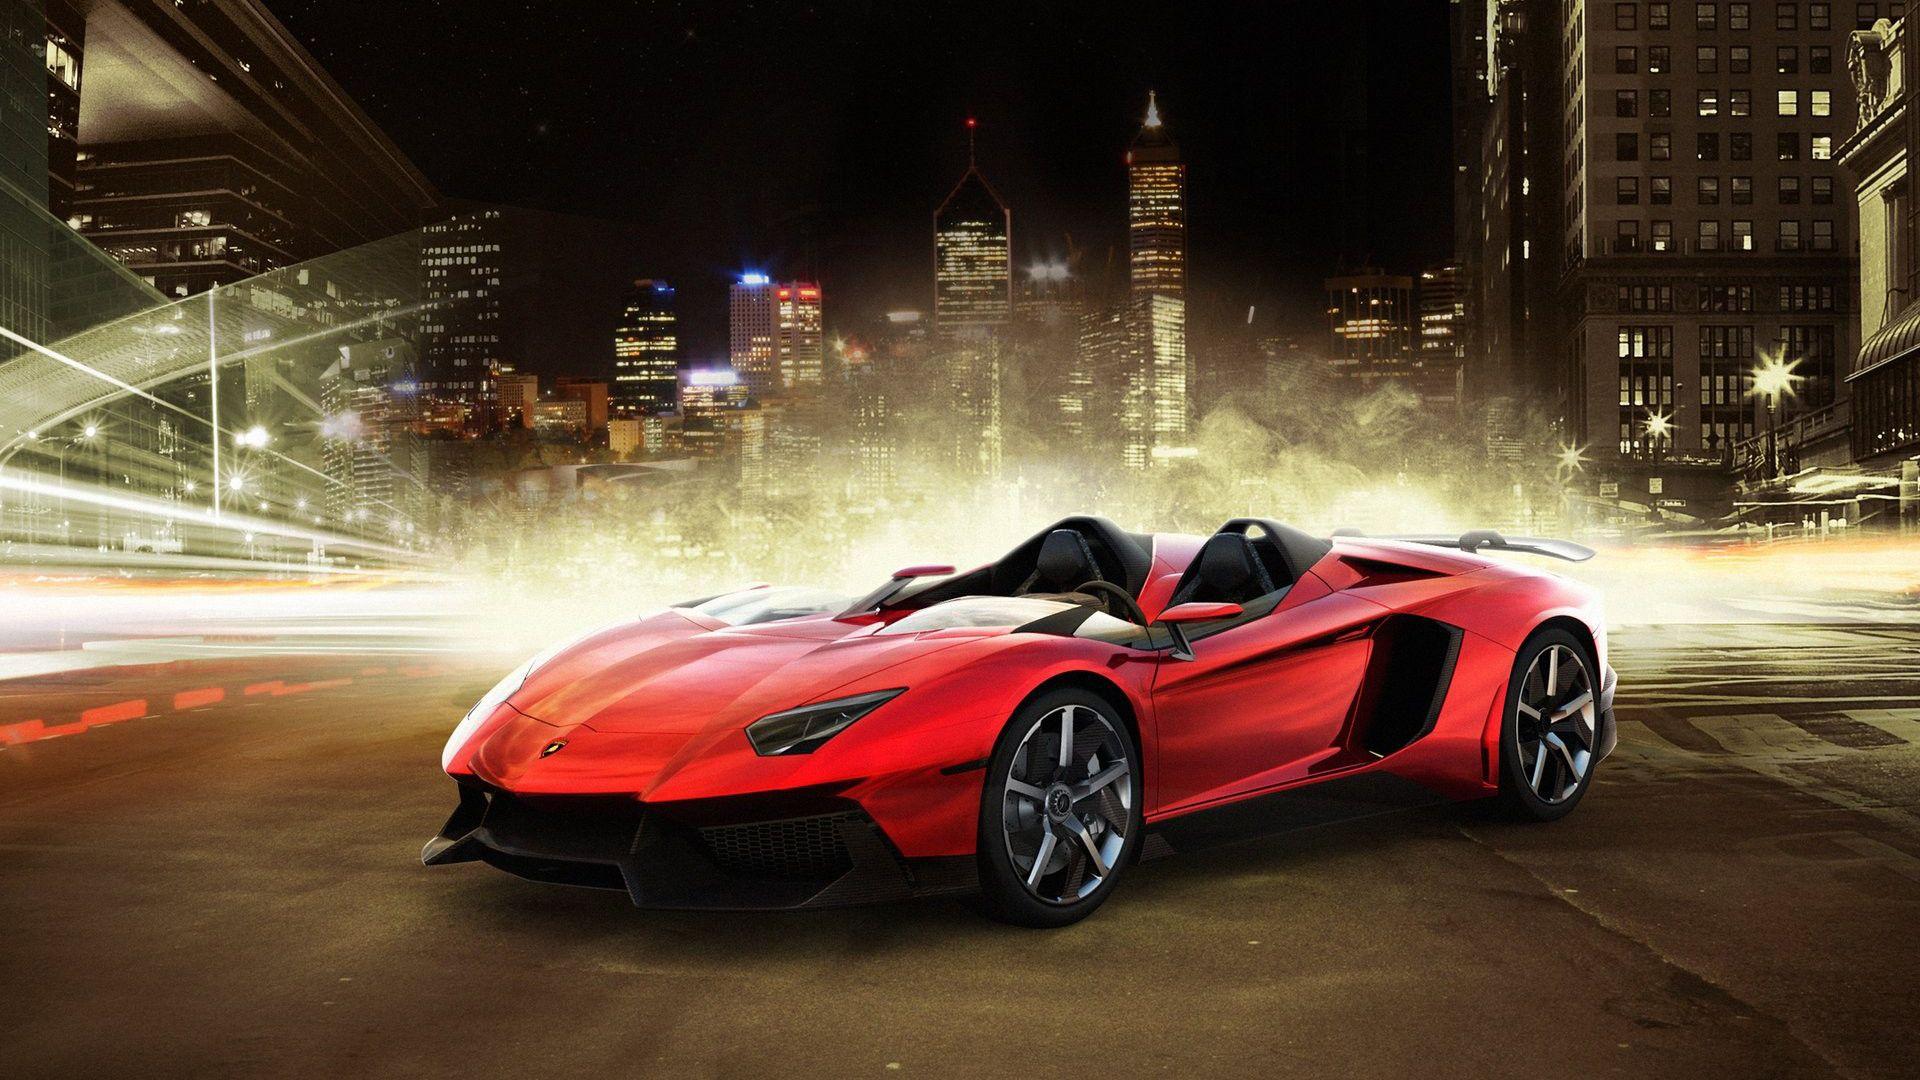 Cars Full Hd Backgrounds 1080p  Pixelstalknet